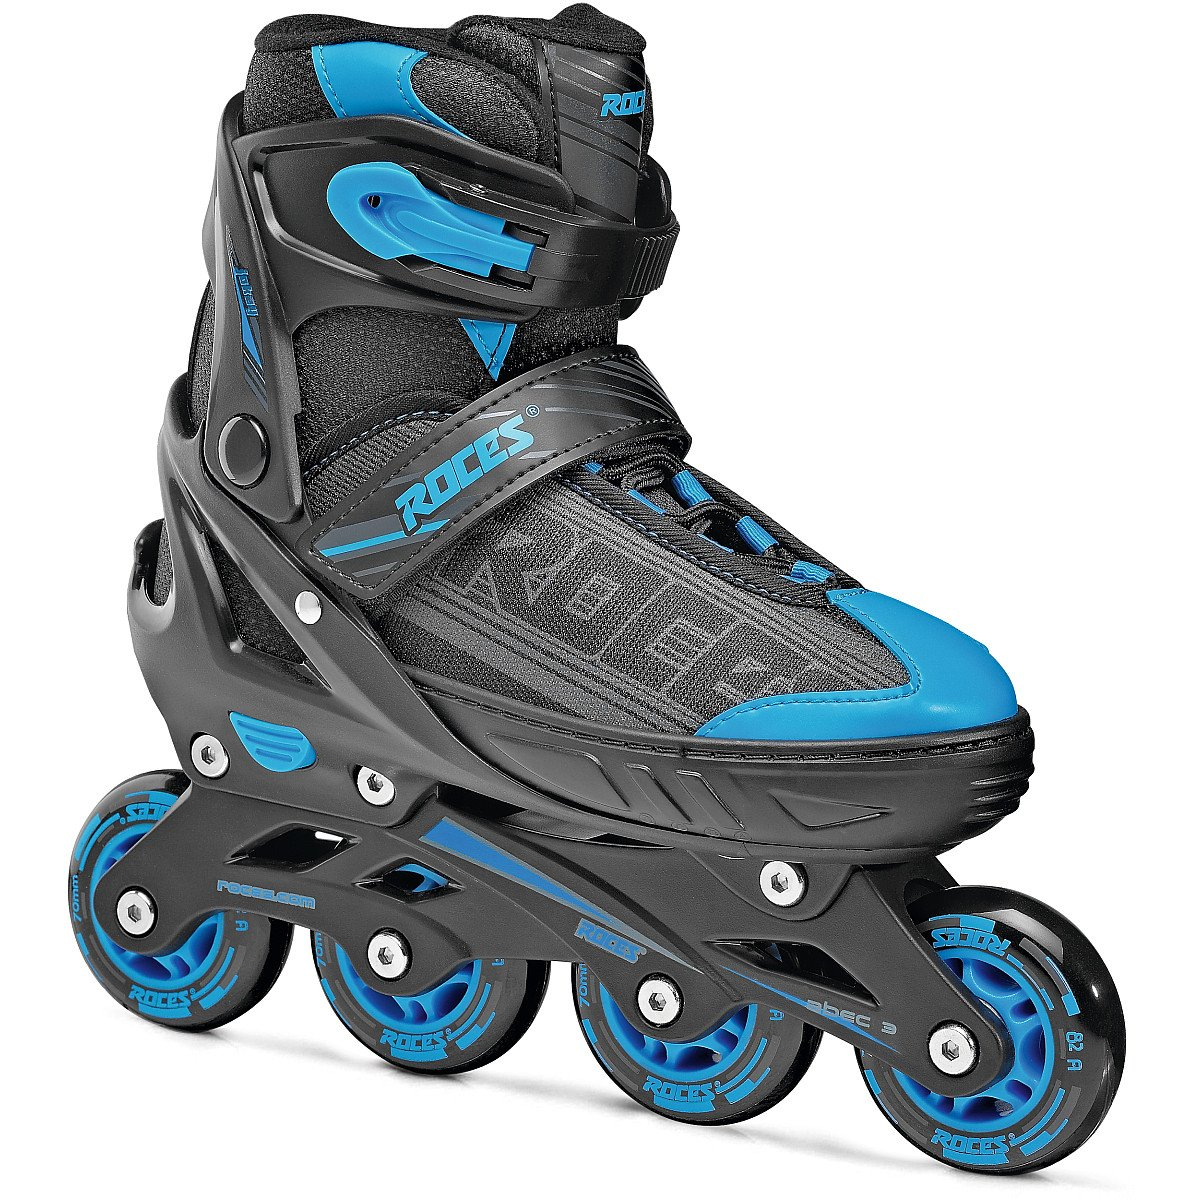 Roces 400810 Men's Model Jokey 1.0 Adjustable Inline Skate, US 2.5-4.5, Black/Astro Blue